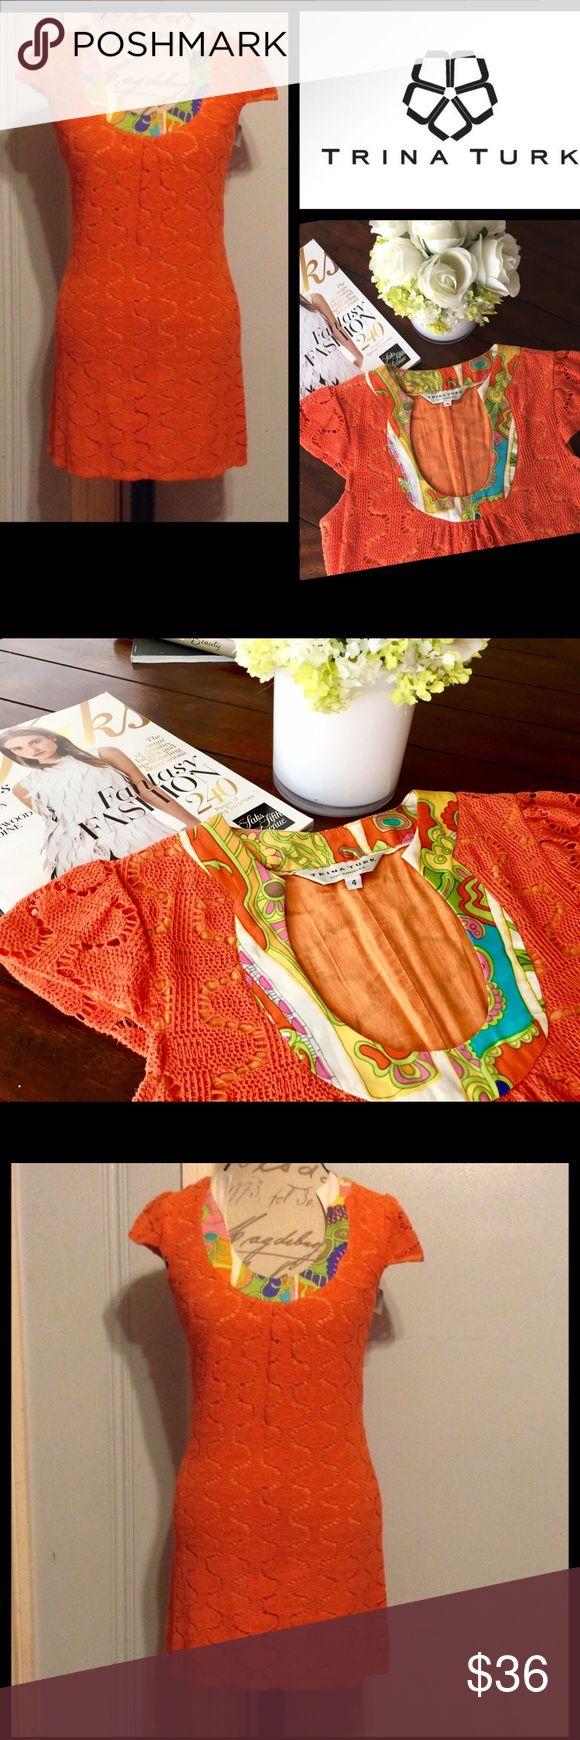 ✴️Trina Turk✴️Crochet Spring Shift Dress ☼Cap Sleeves, Knee Length, Yoke Neck Design ☼Gorgeous Orange/Coral-like Spring & Summer Color! ☼Size:  4 ☼Worn twice, fantastic condition💎 ☼Mom purchased at retail $248 🔥 ☼Make offers 😘 & Bundle to save 20%! Trina Turk Dresses Mini